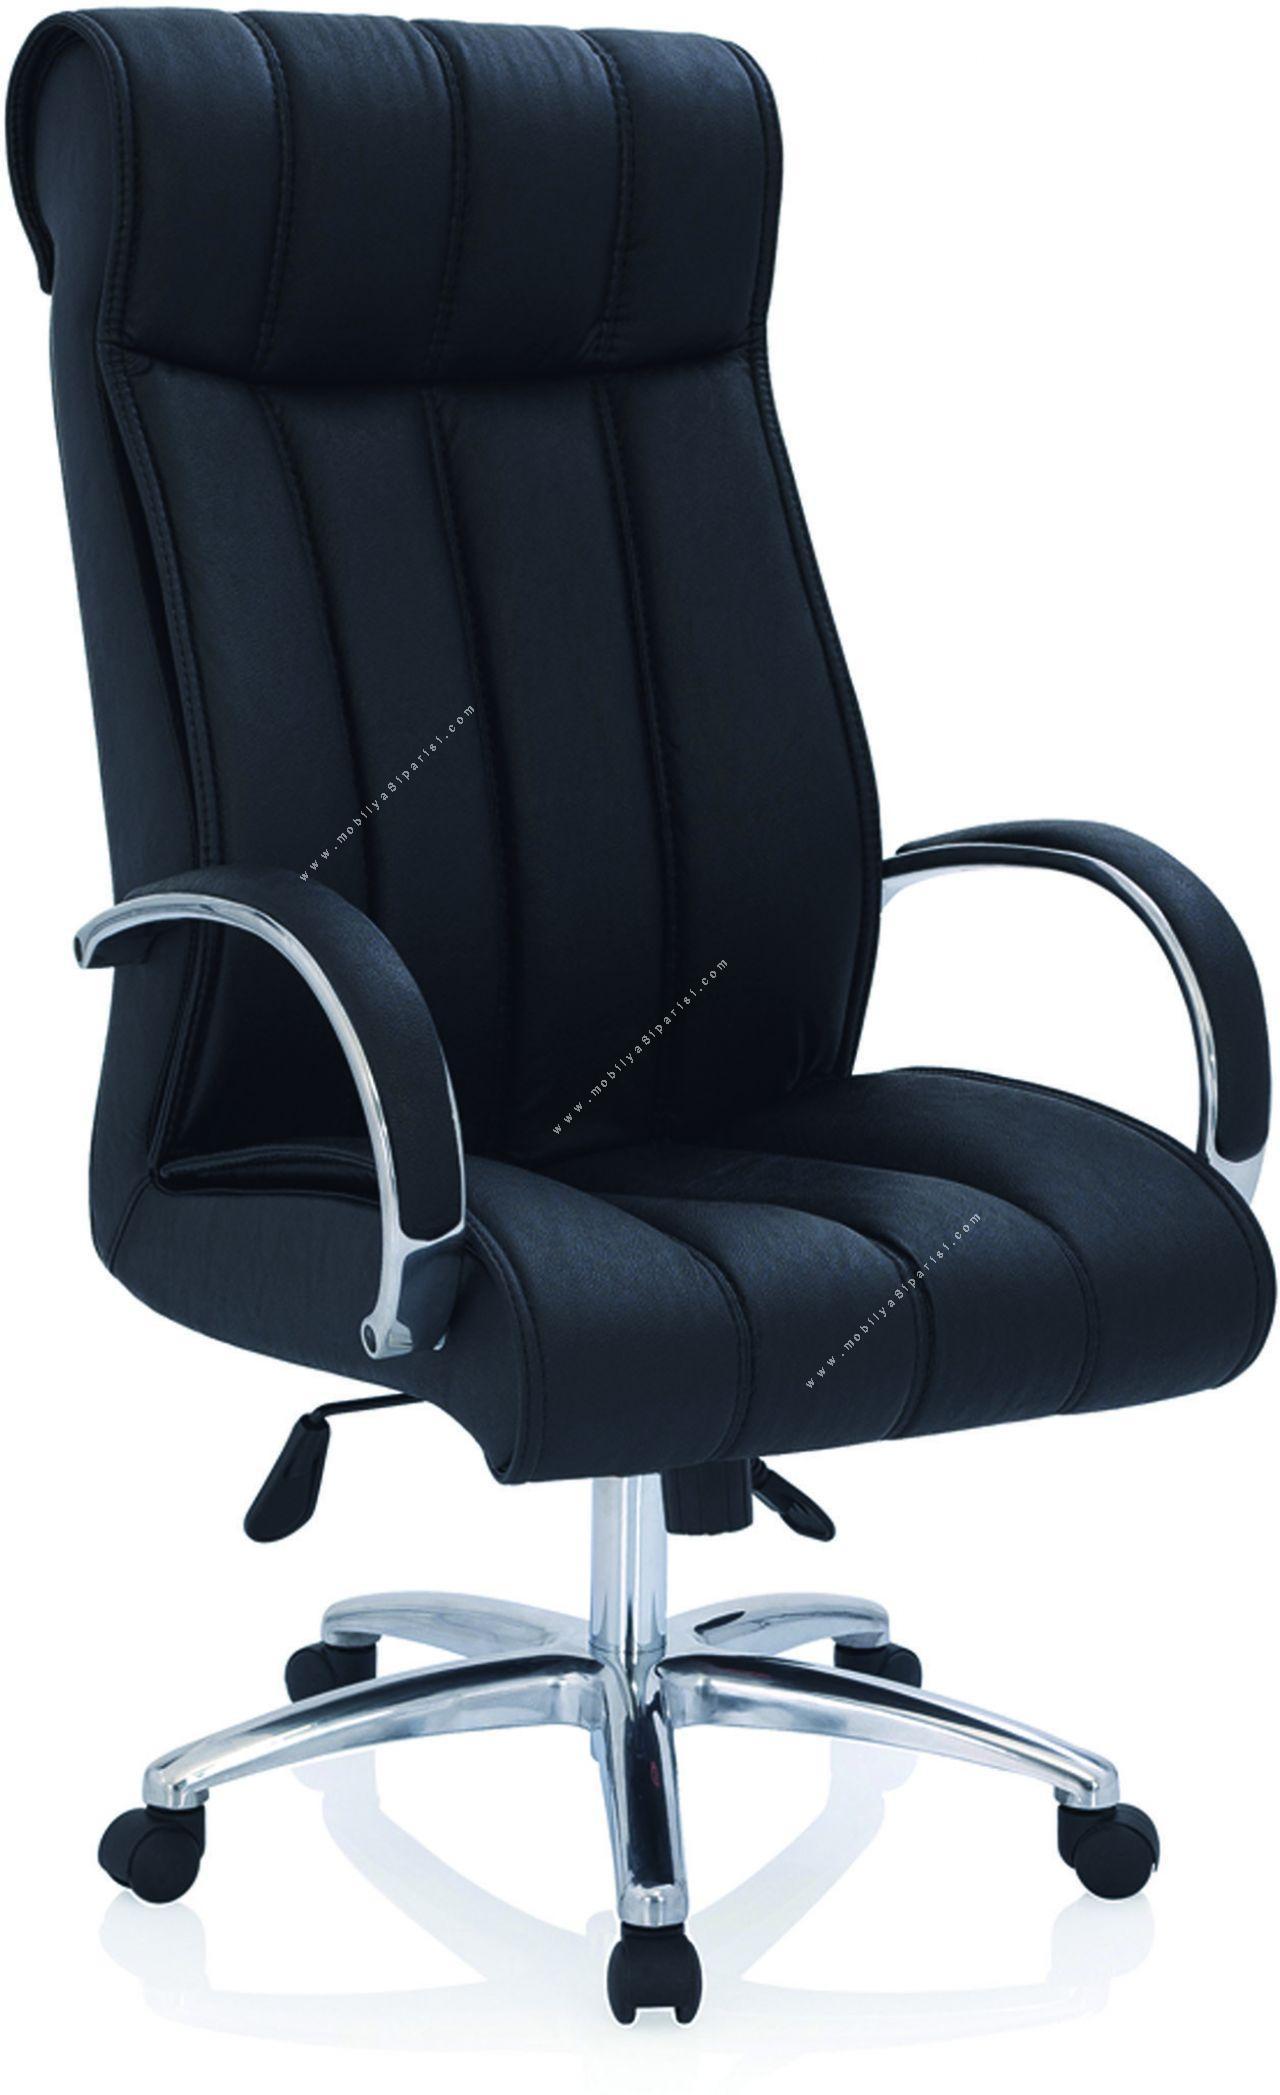 one rahat yönetici ofis koltuğu